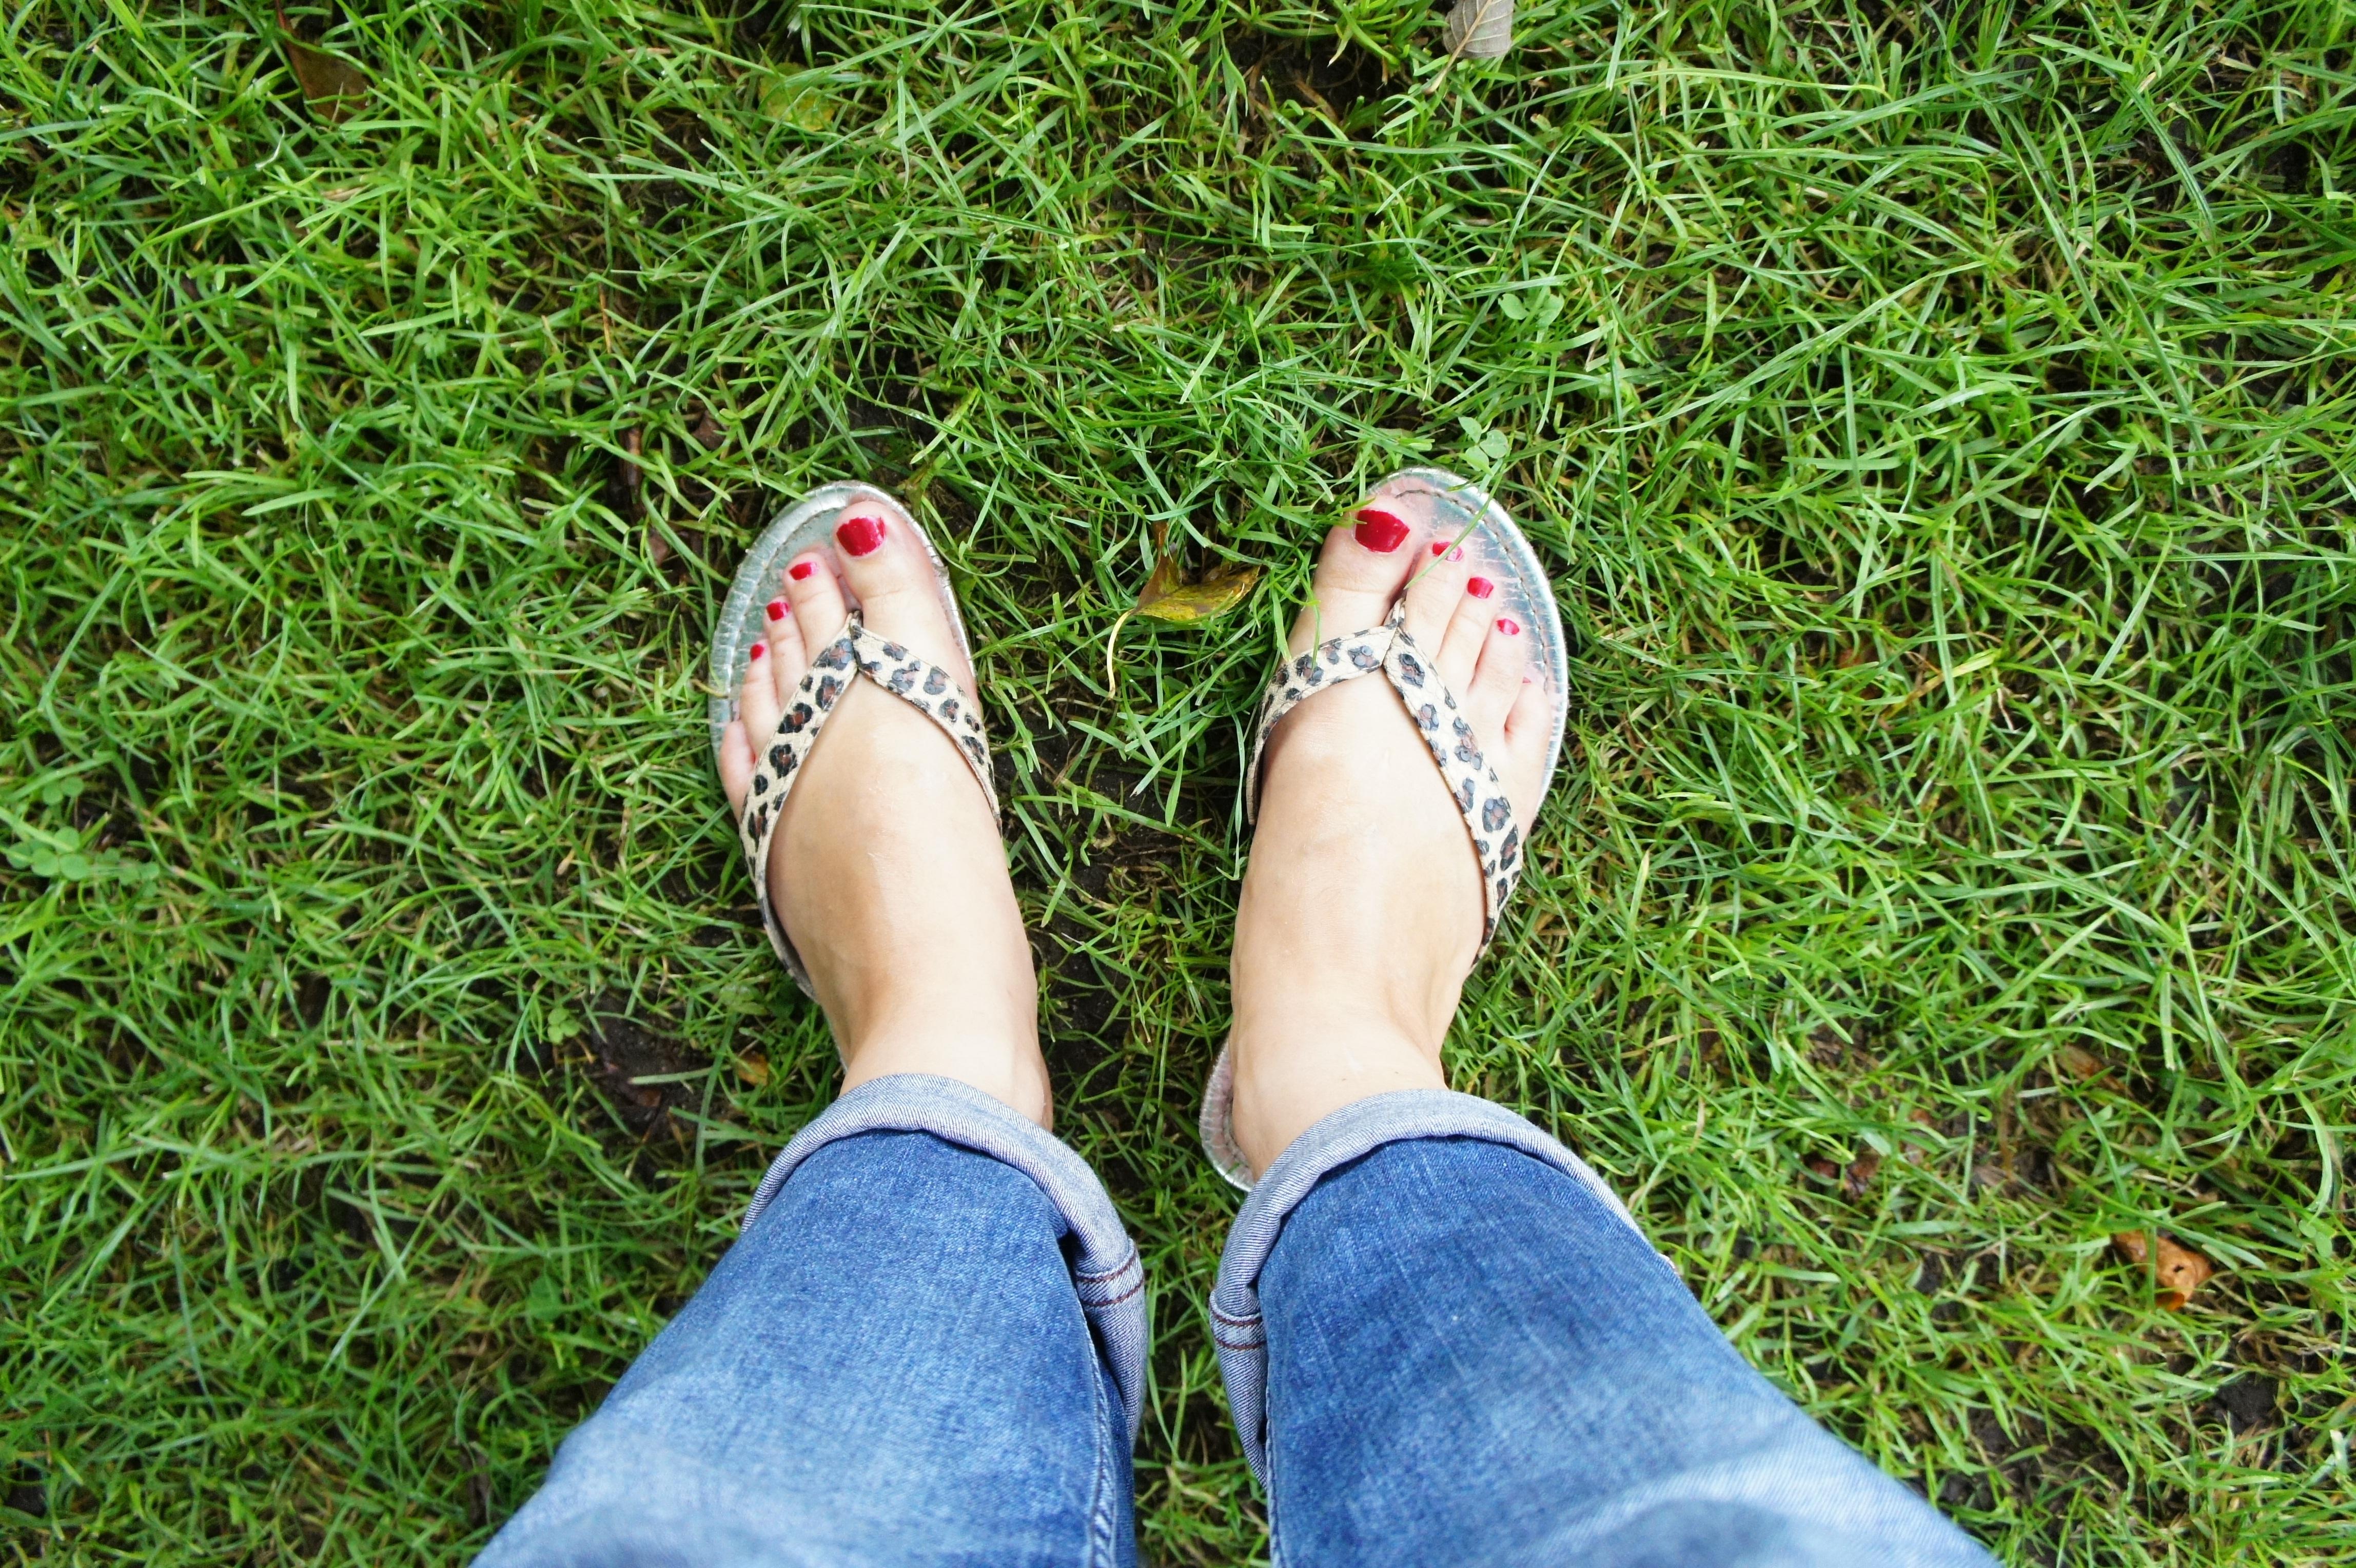 Fotos gratis : mano, césped, zapato, mujer, Pies, hembra, pierna ...